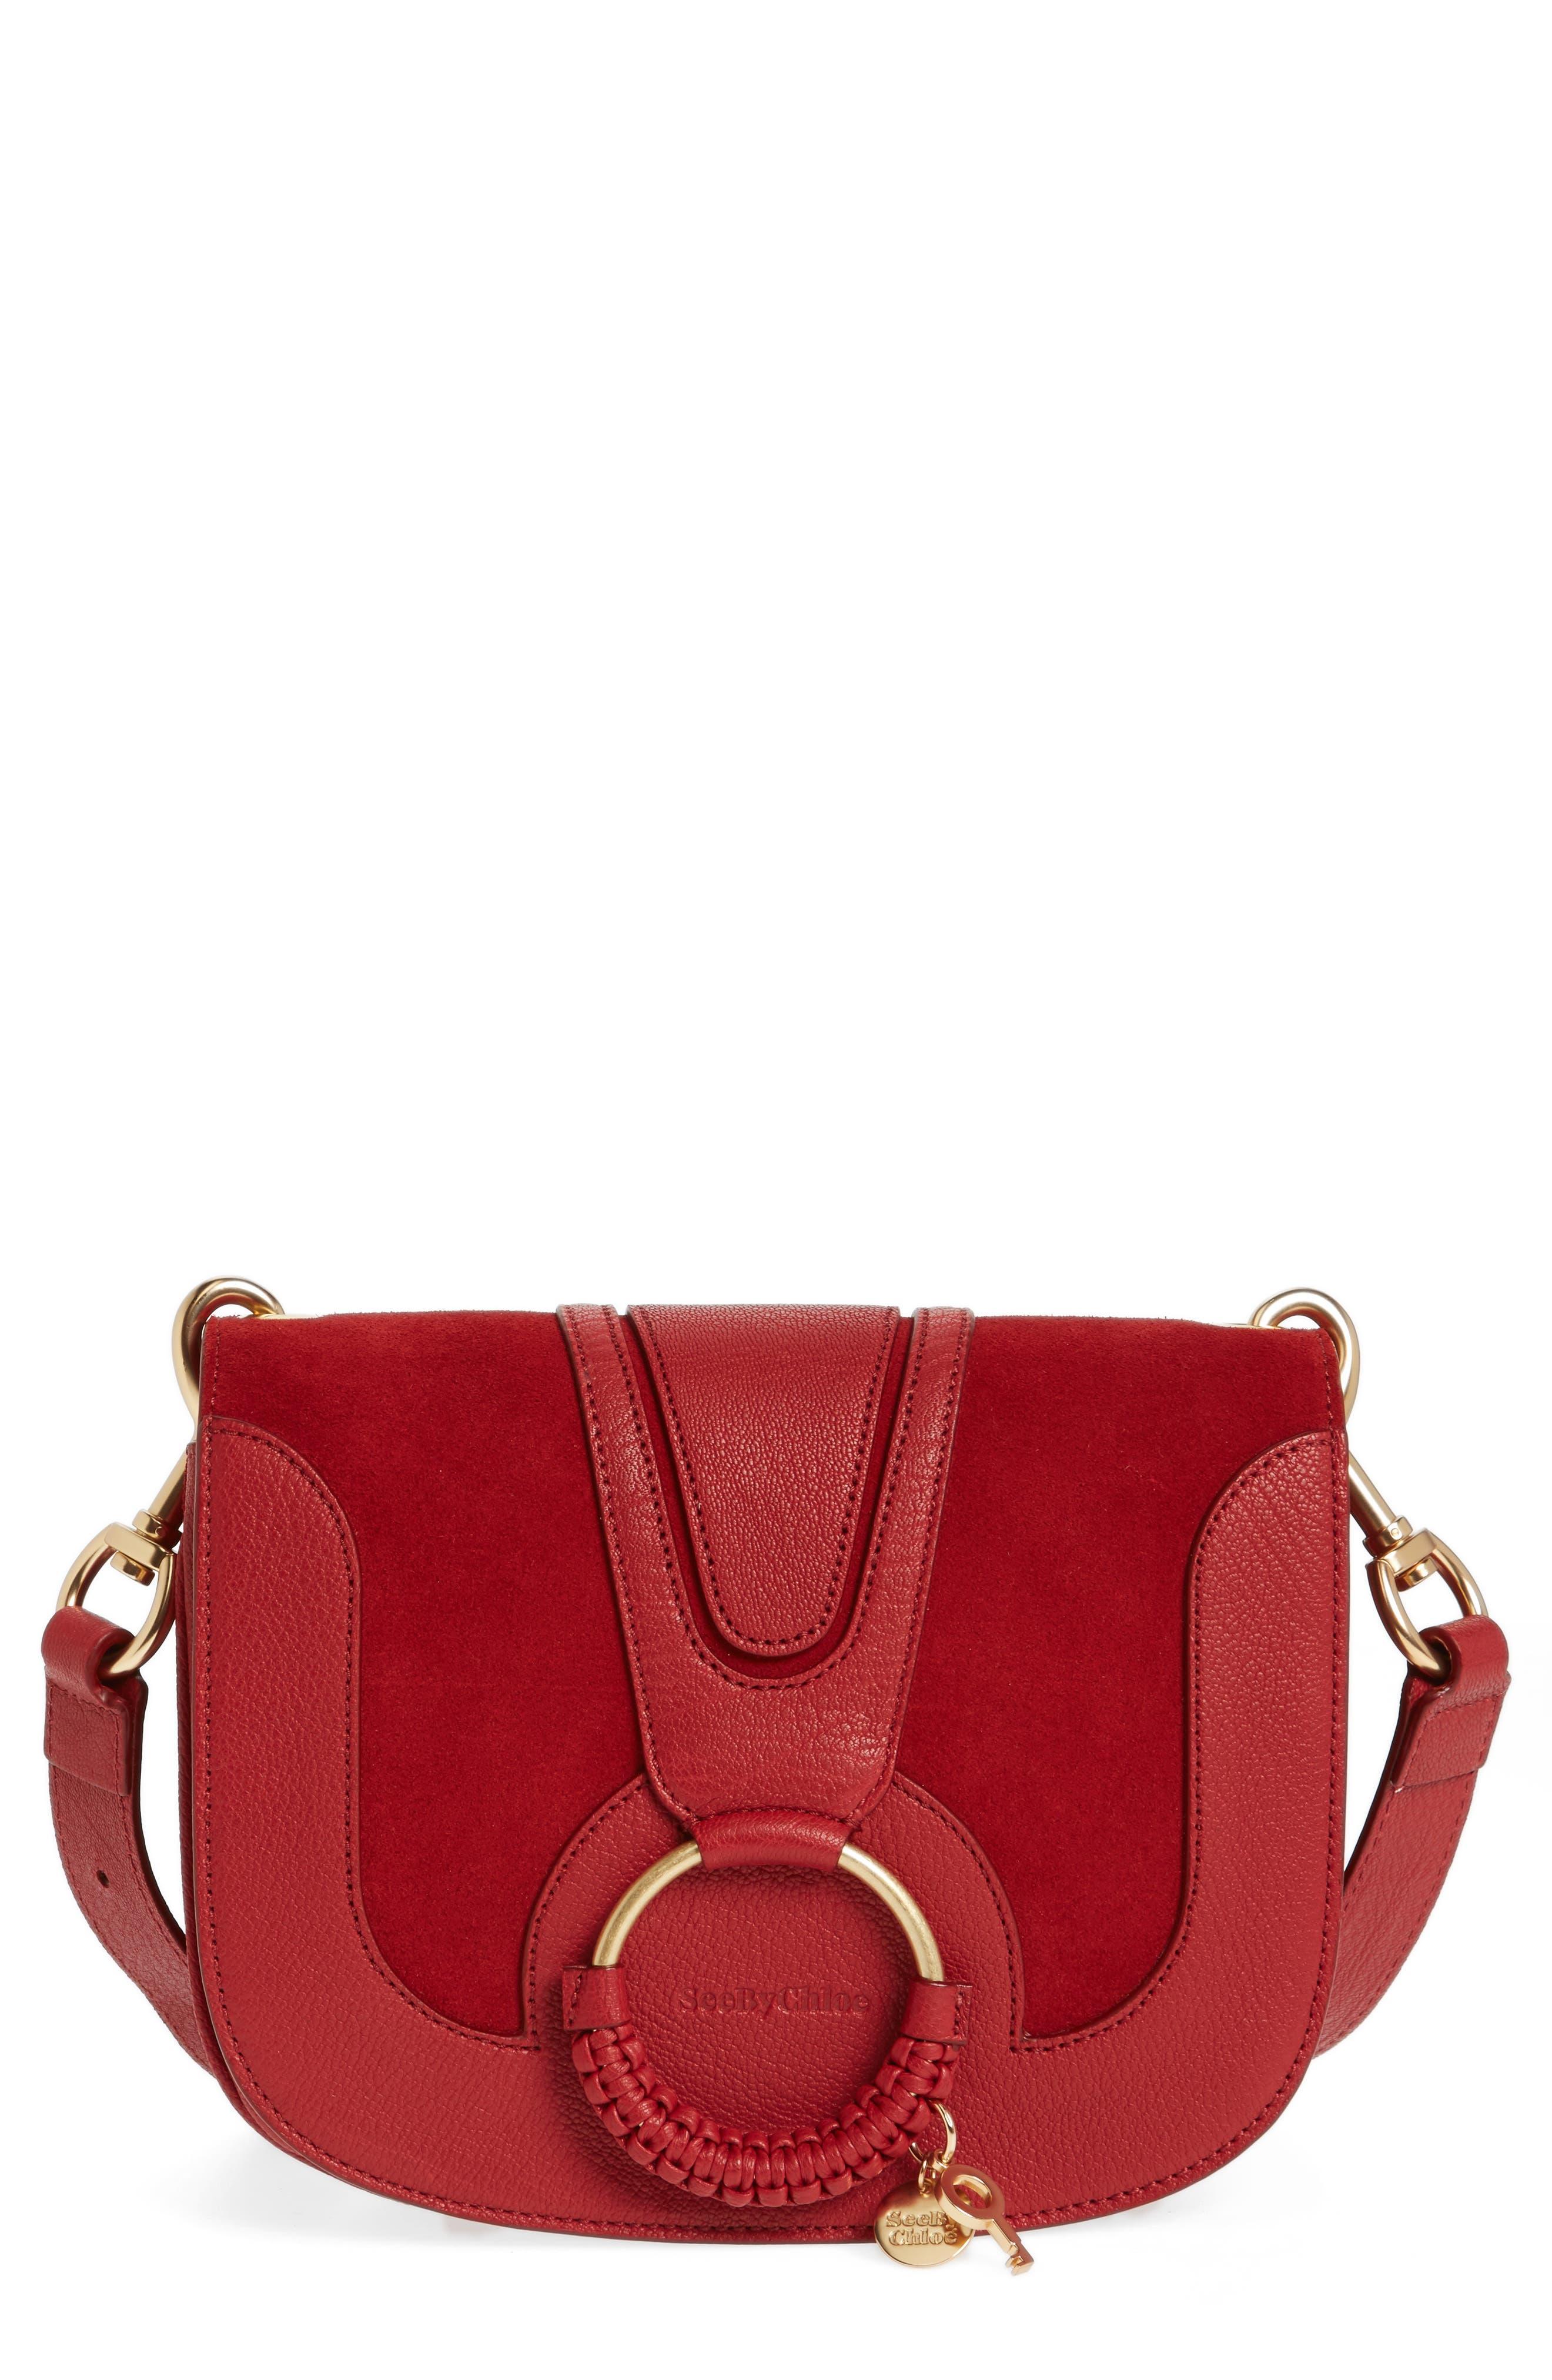 Hana Small Leather Crossbody Bag,                             Main thumbnail 7, color,